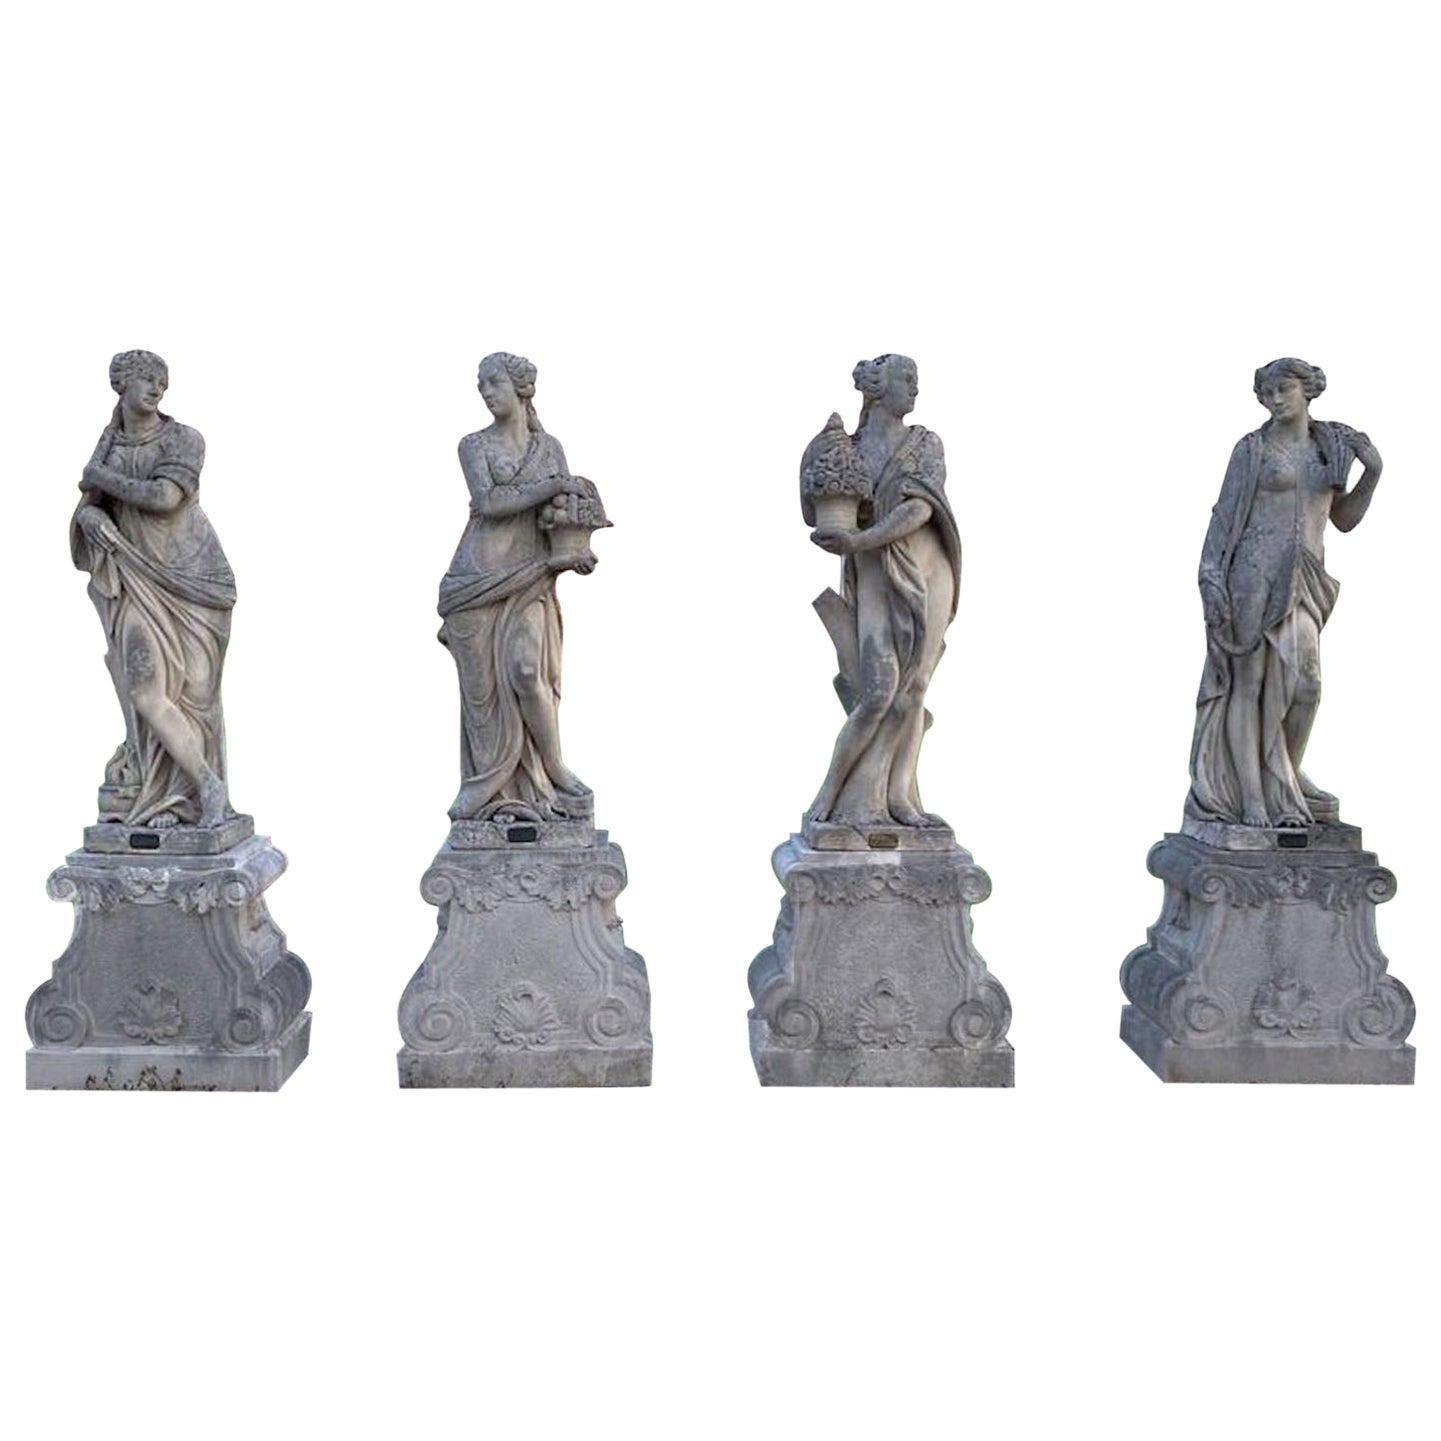 Italian Stone Garden Statues Representing the Four Seasons